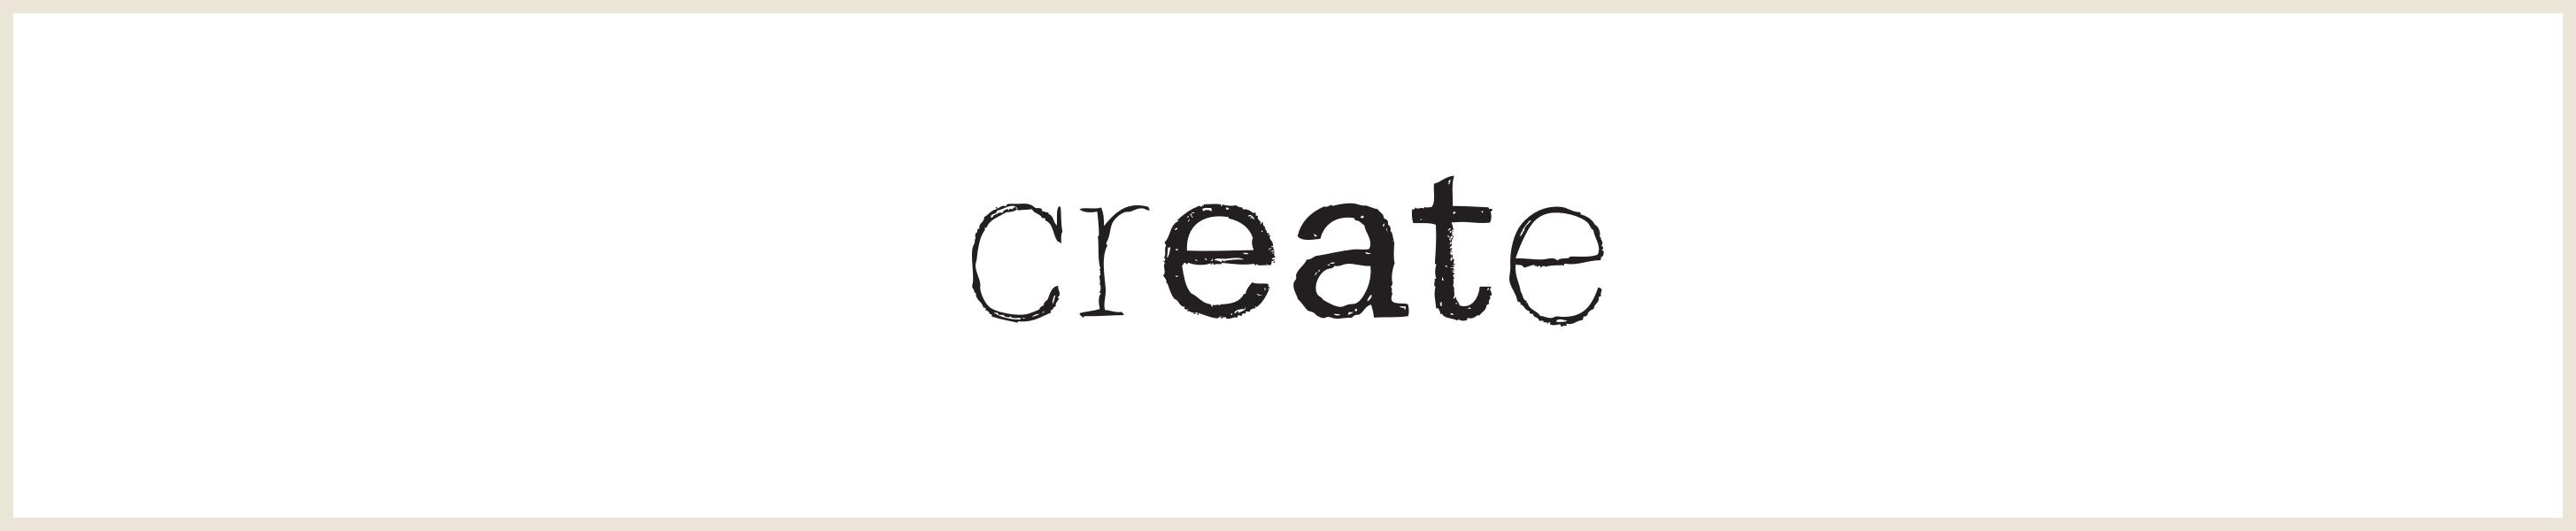 create@3x